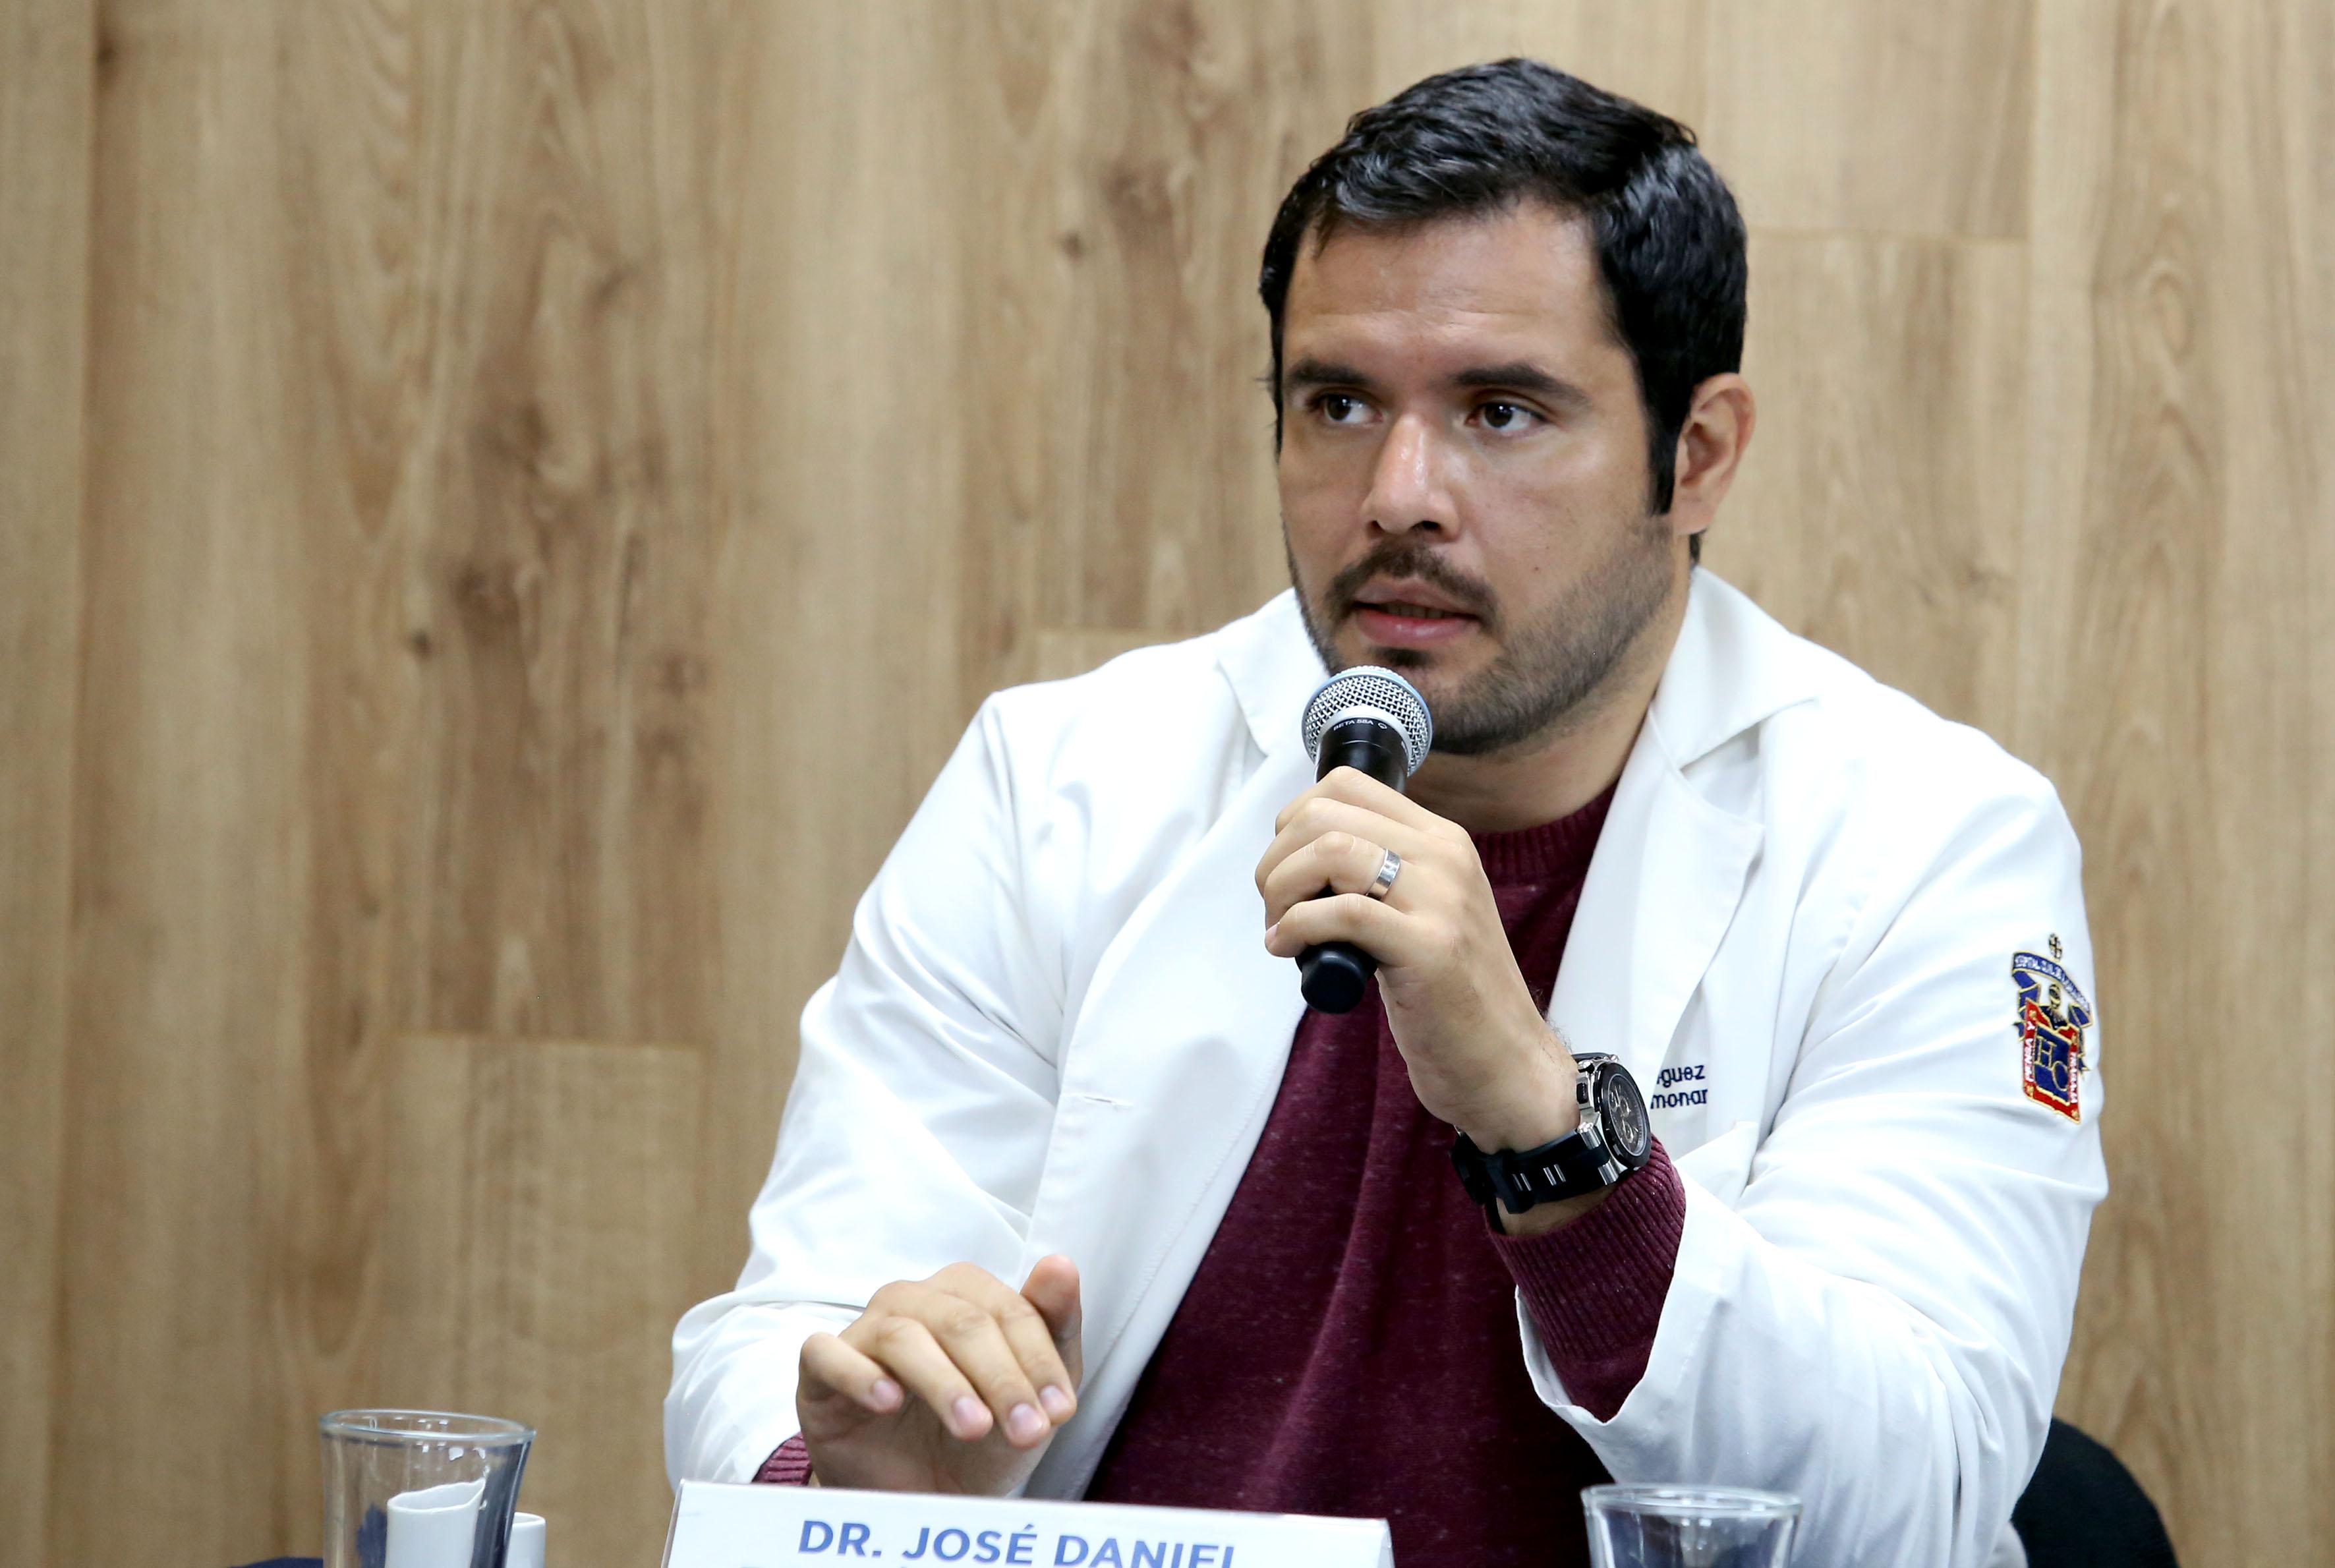 Dr. Daniel Rodríguez Jiménez al micrófono